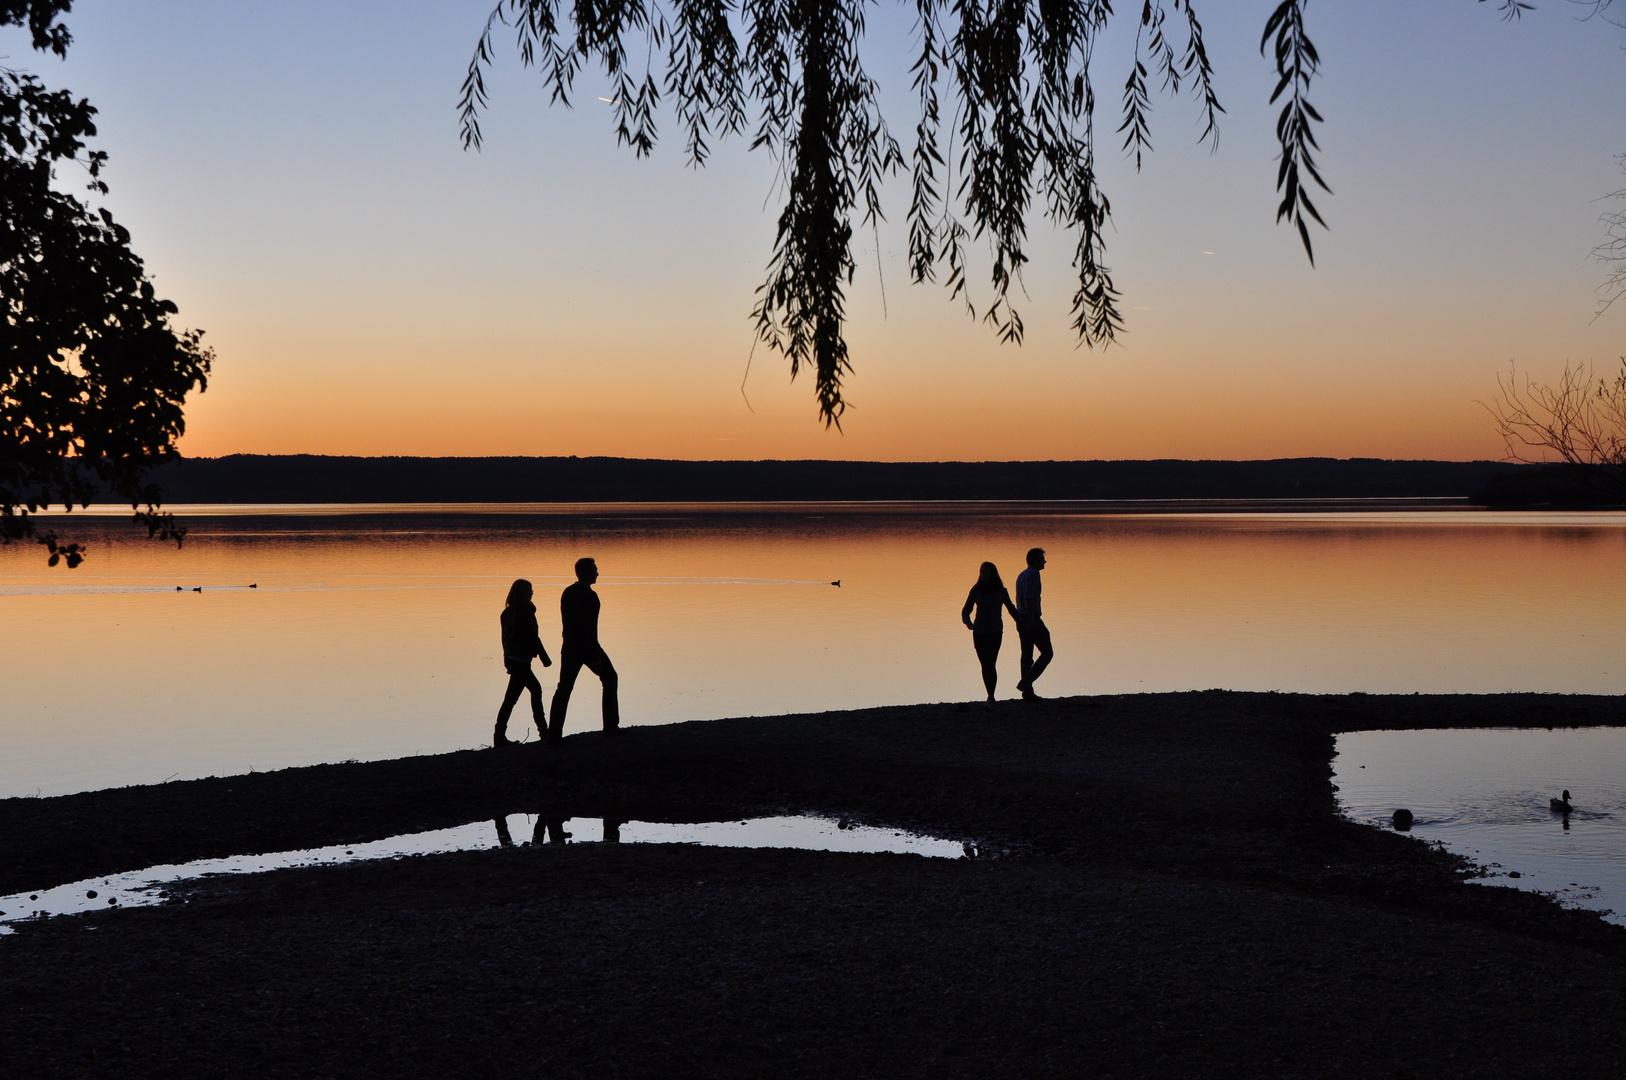 Sonnenuntergang am Ammersee, Bayern 115